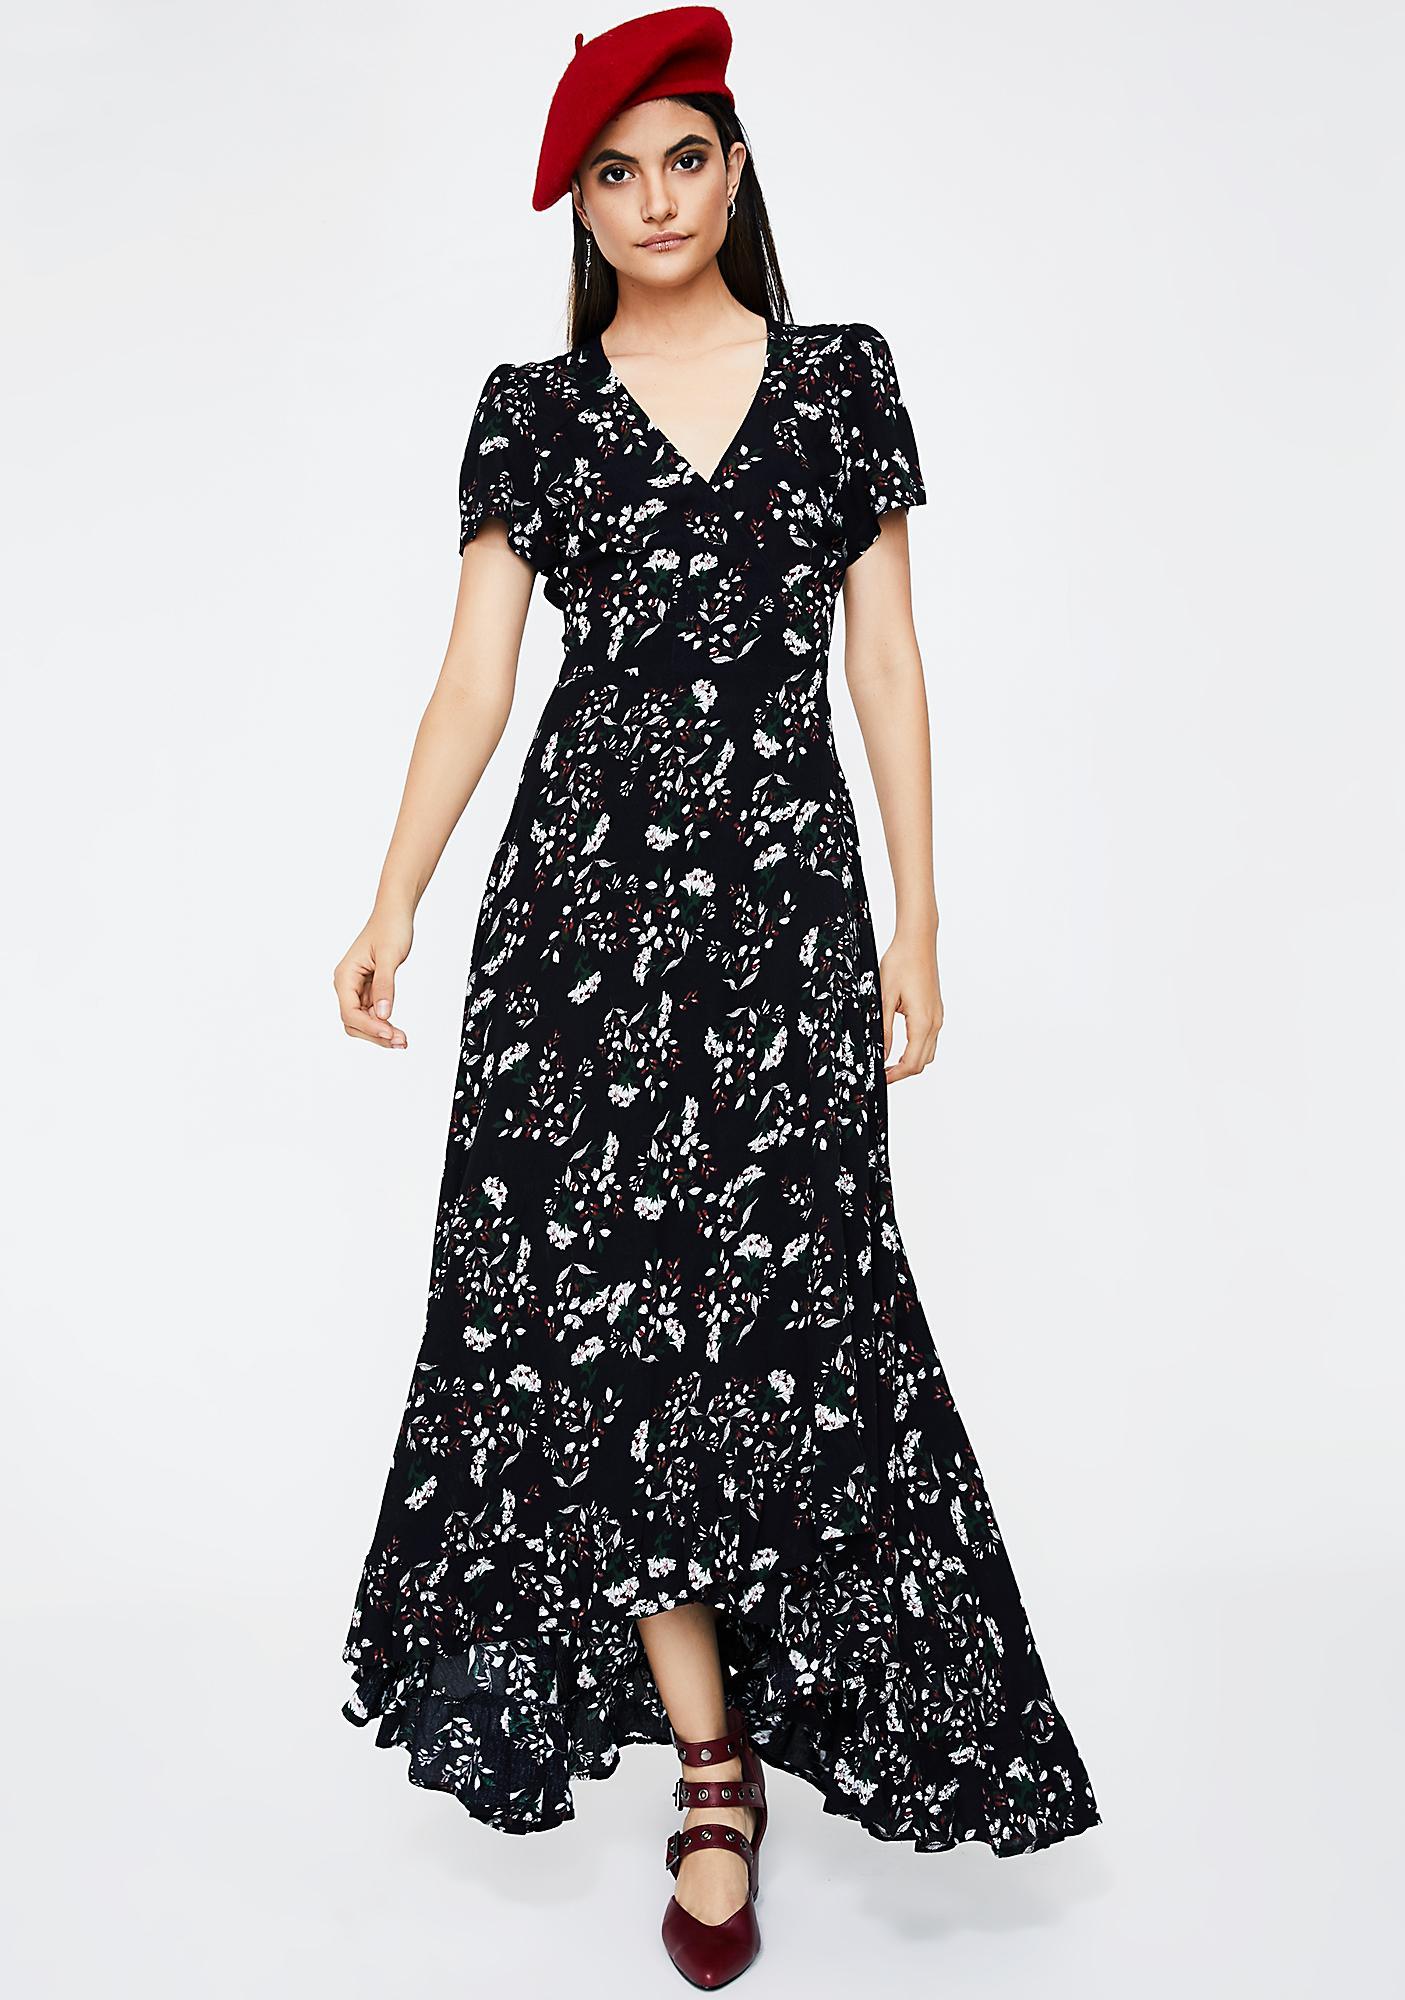 Lira Clothing Taryn Dress